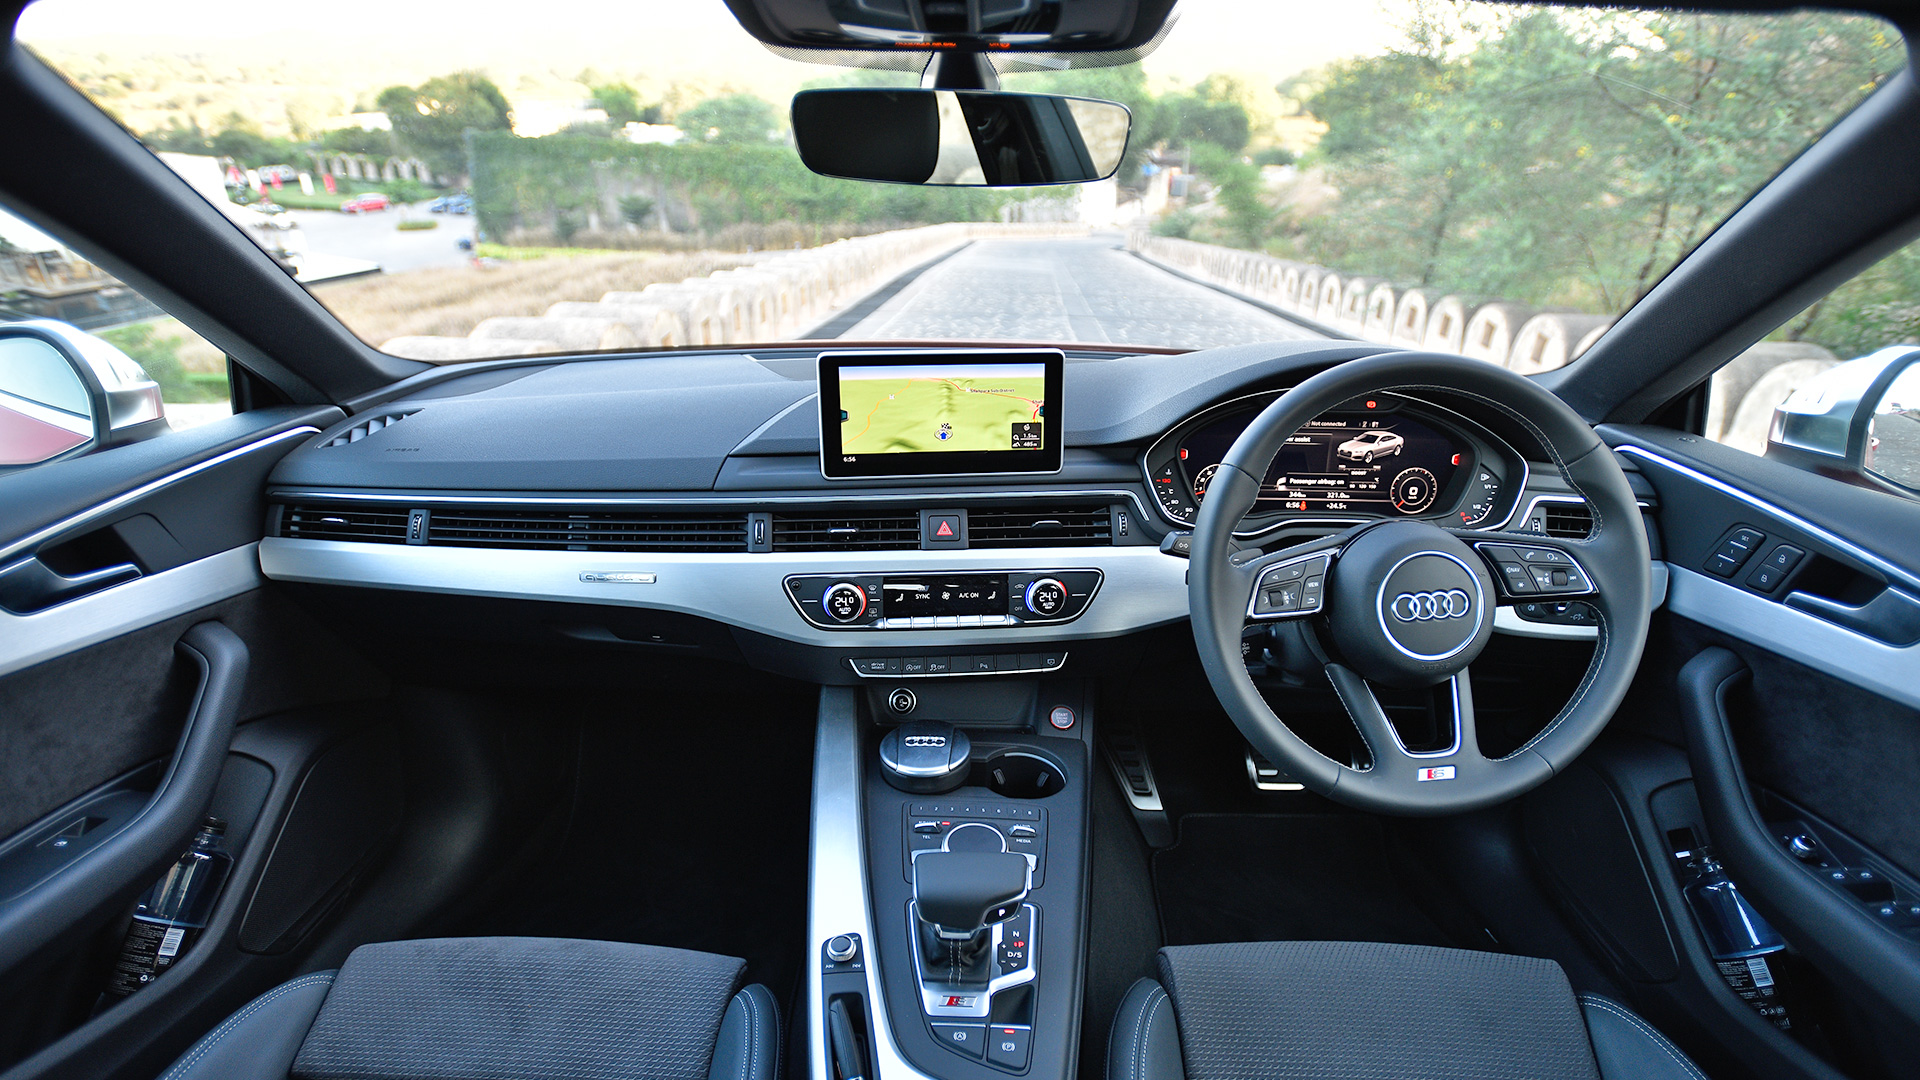 Audi S5 sportback 2017 STD Interior Car Photos - Overdrive